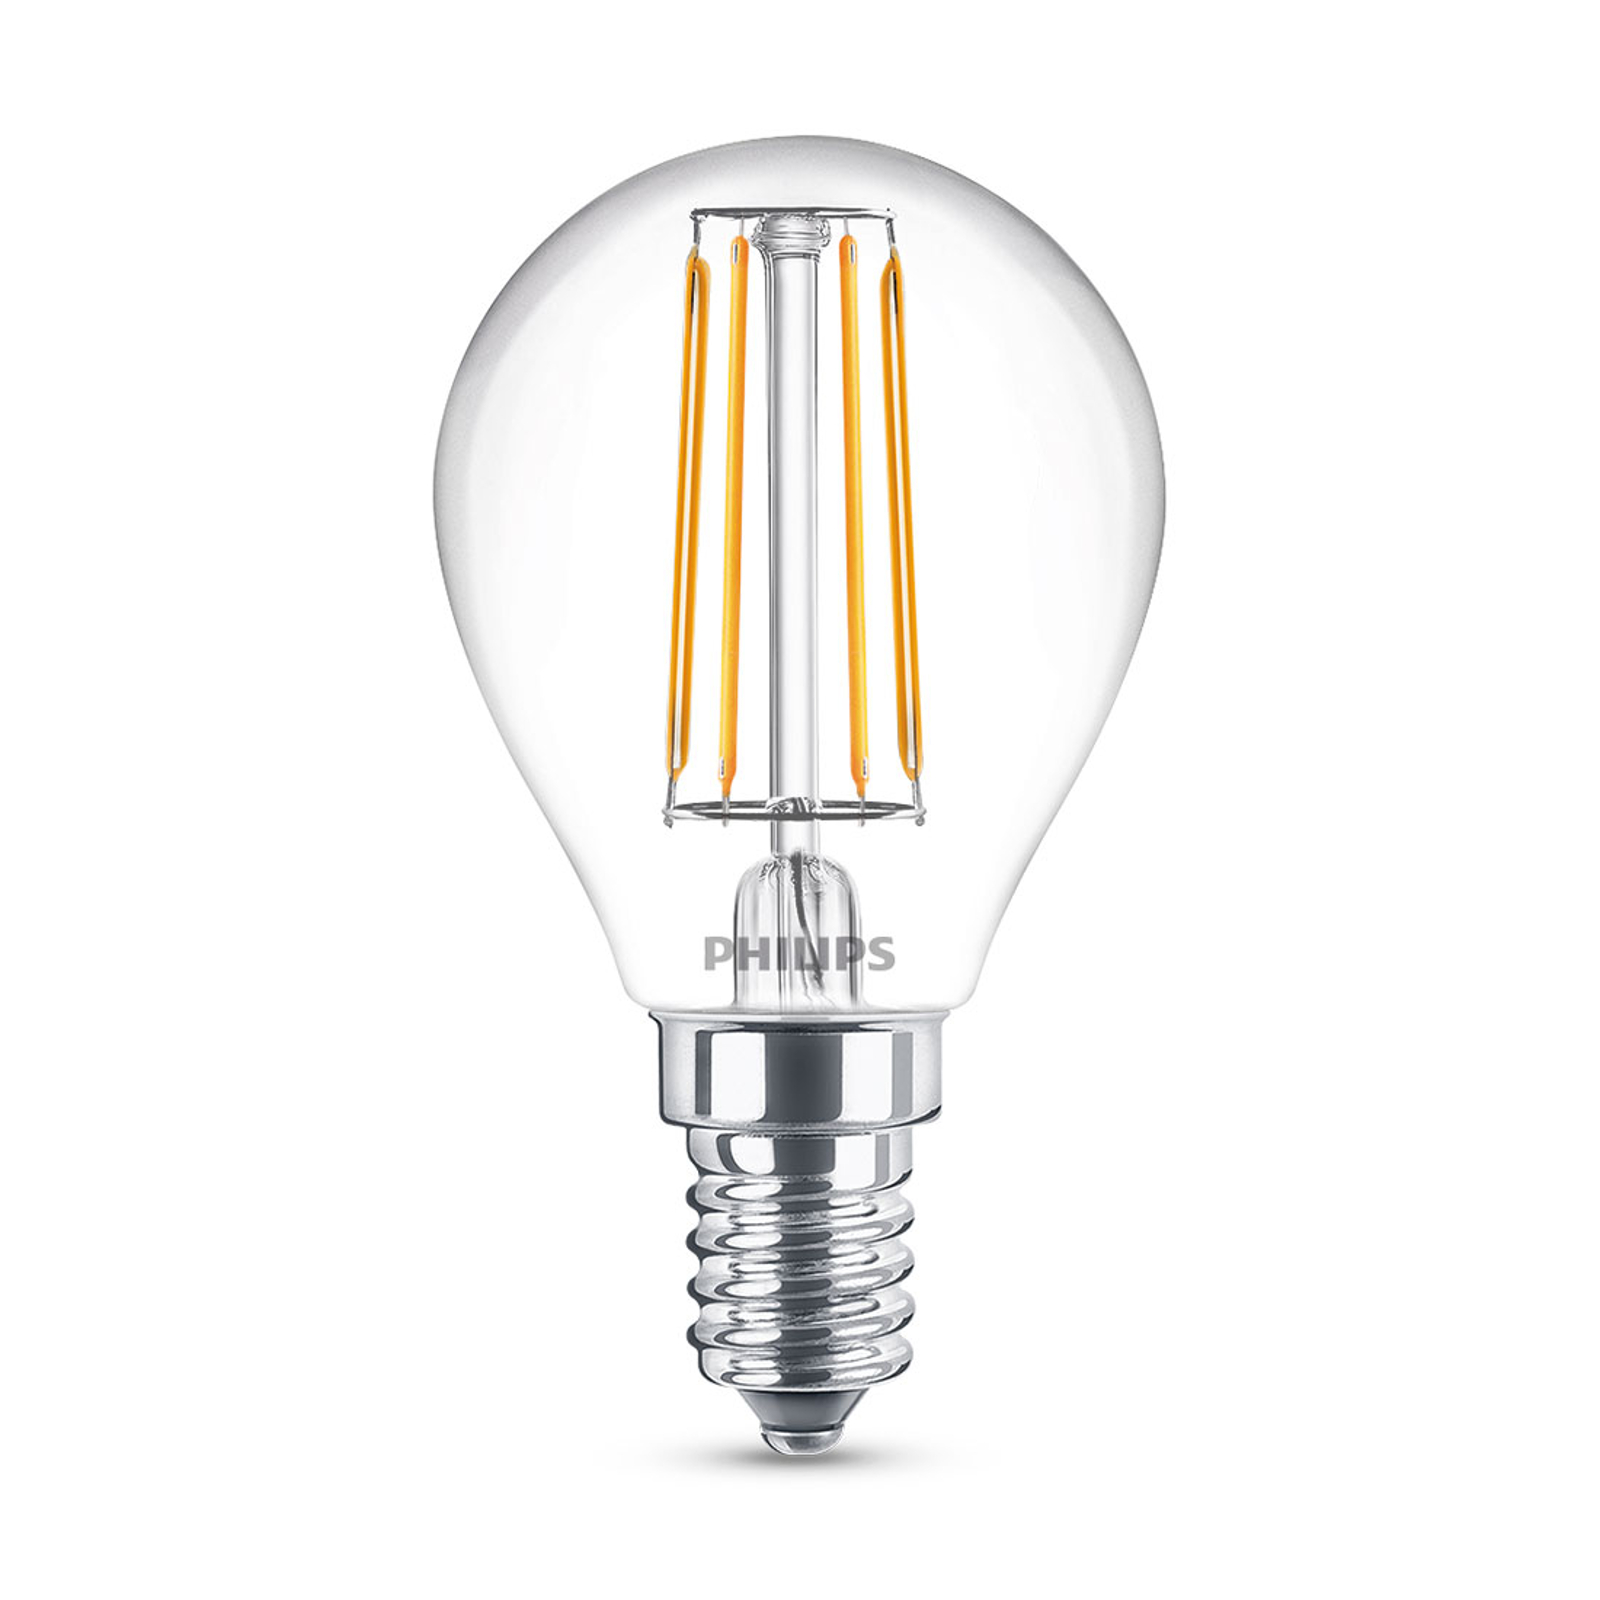 Philips Classic żarówka LED E14 P45 4,3W 4000K